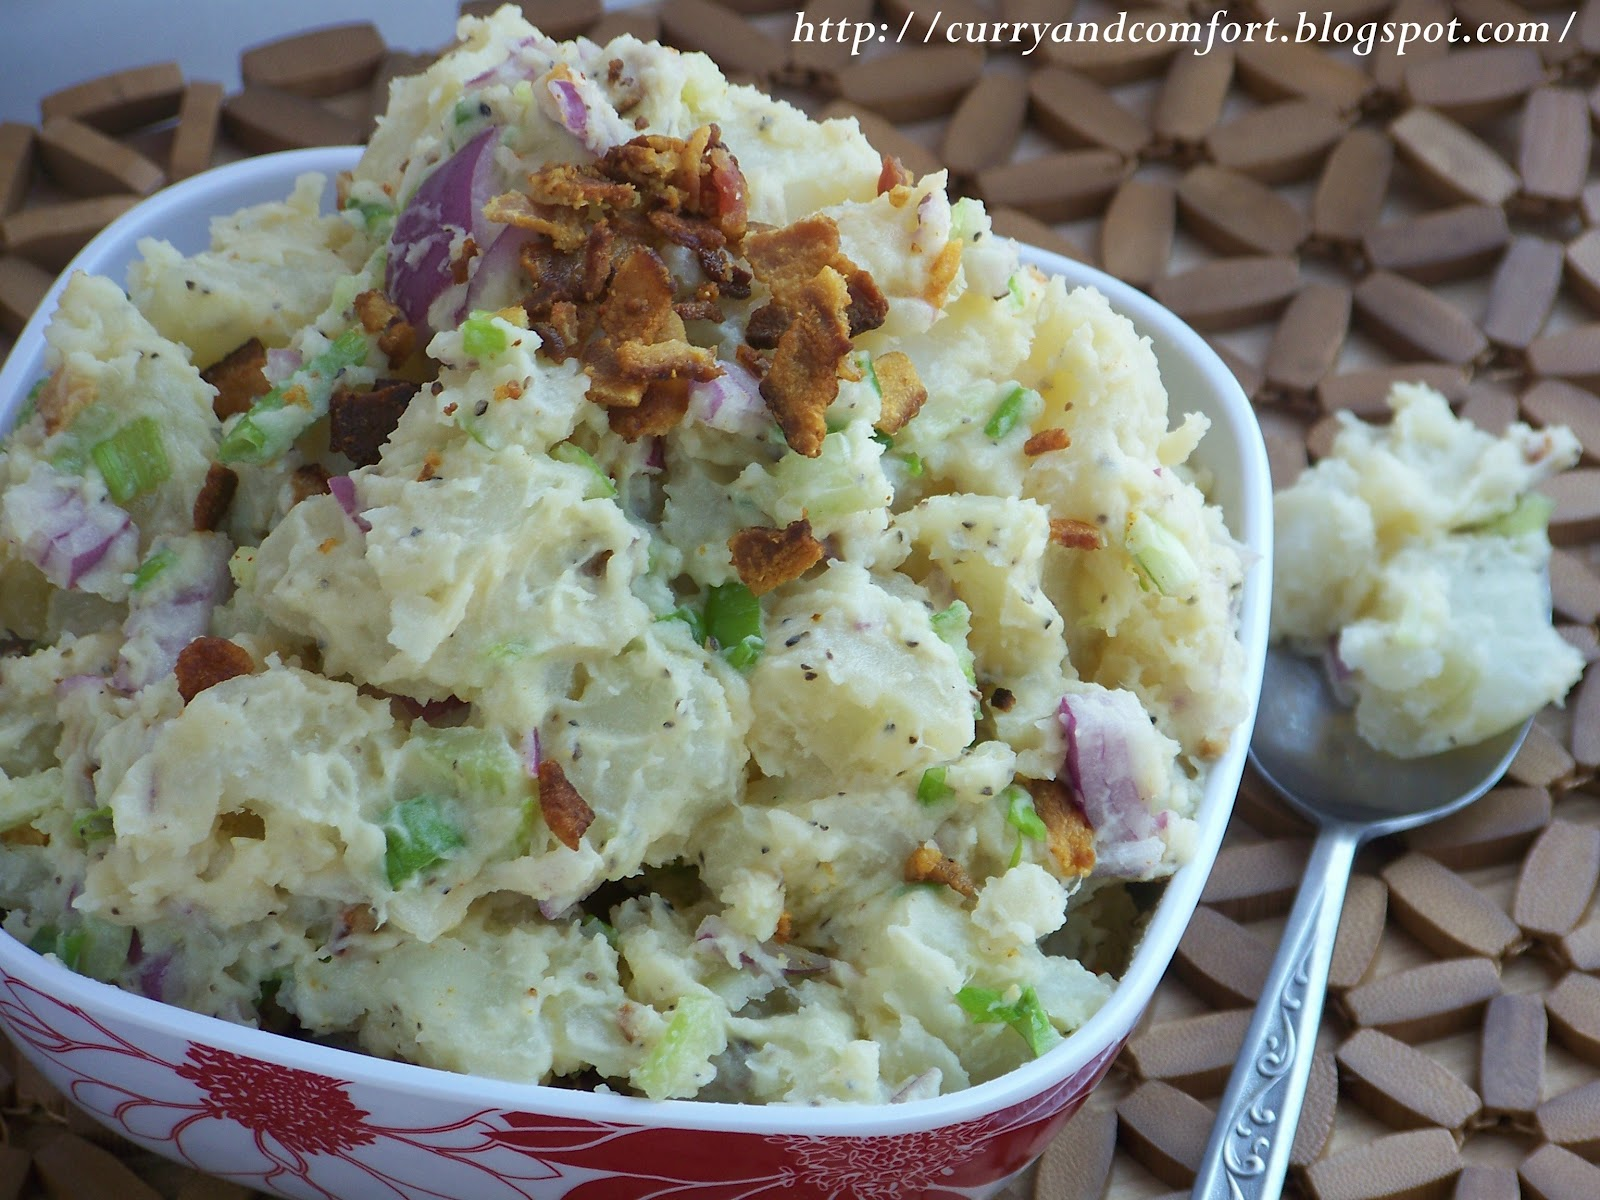 Potato Salad without Egg